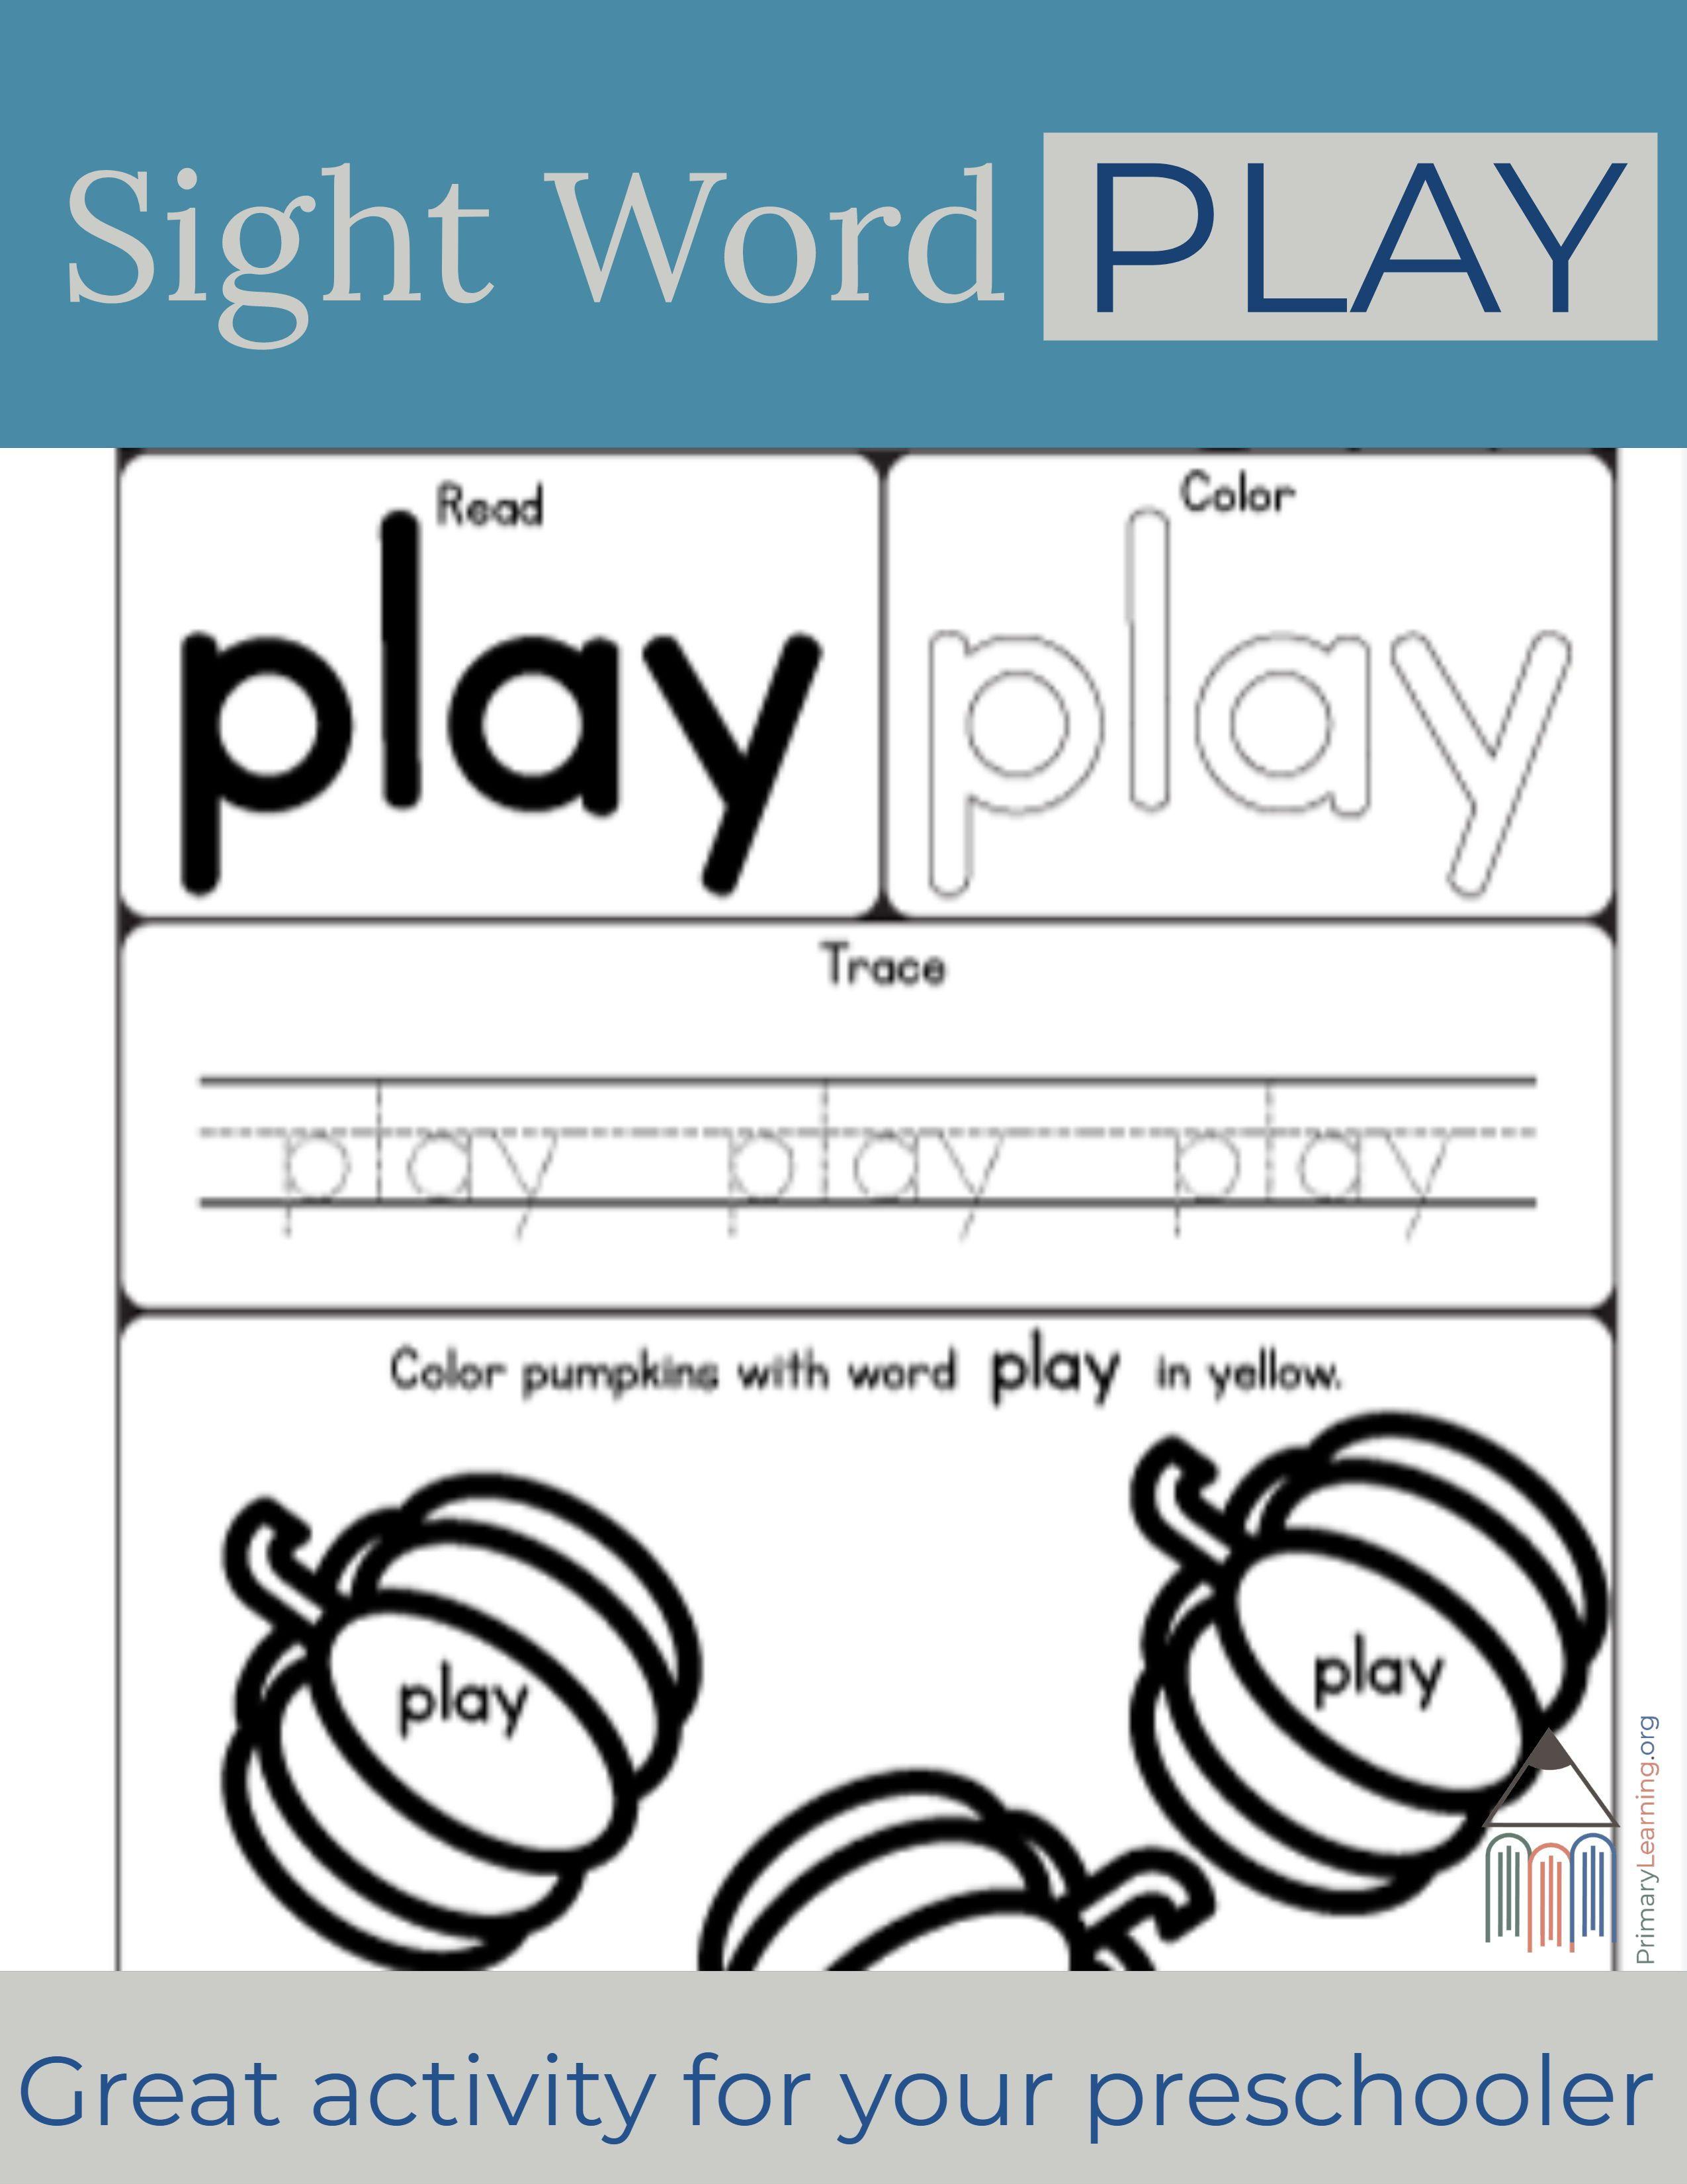 Sight Word Play Worksheet